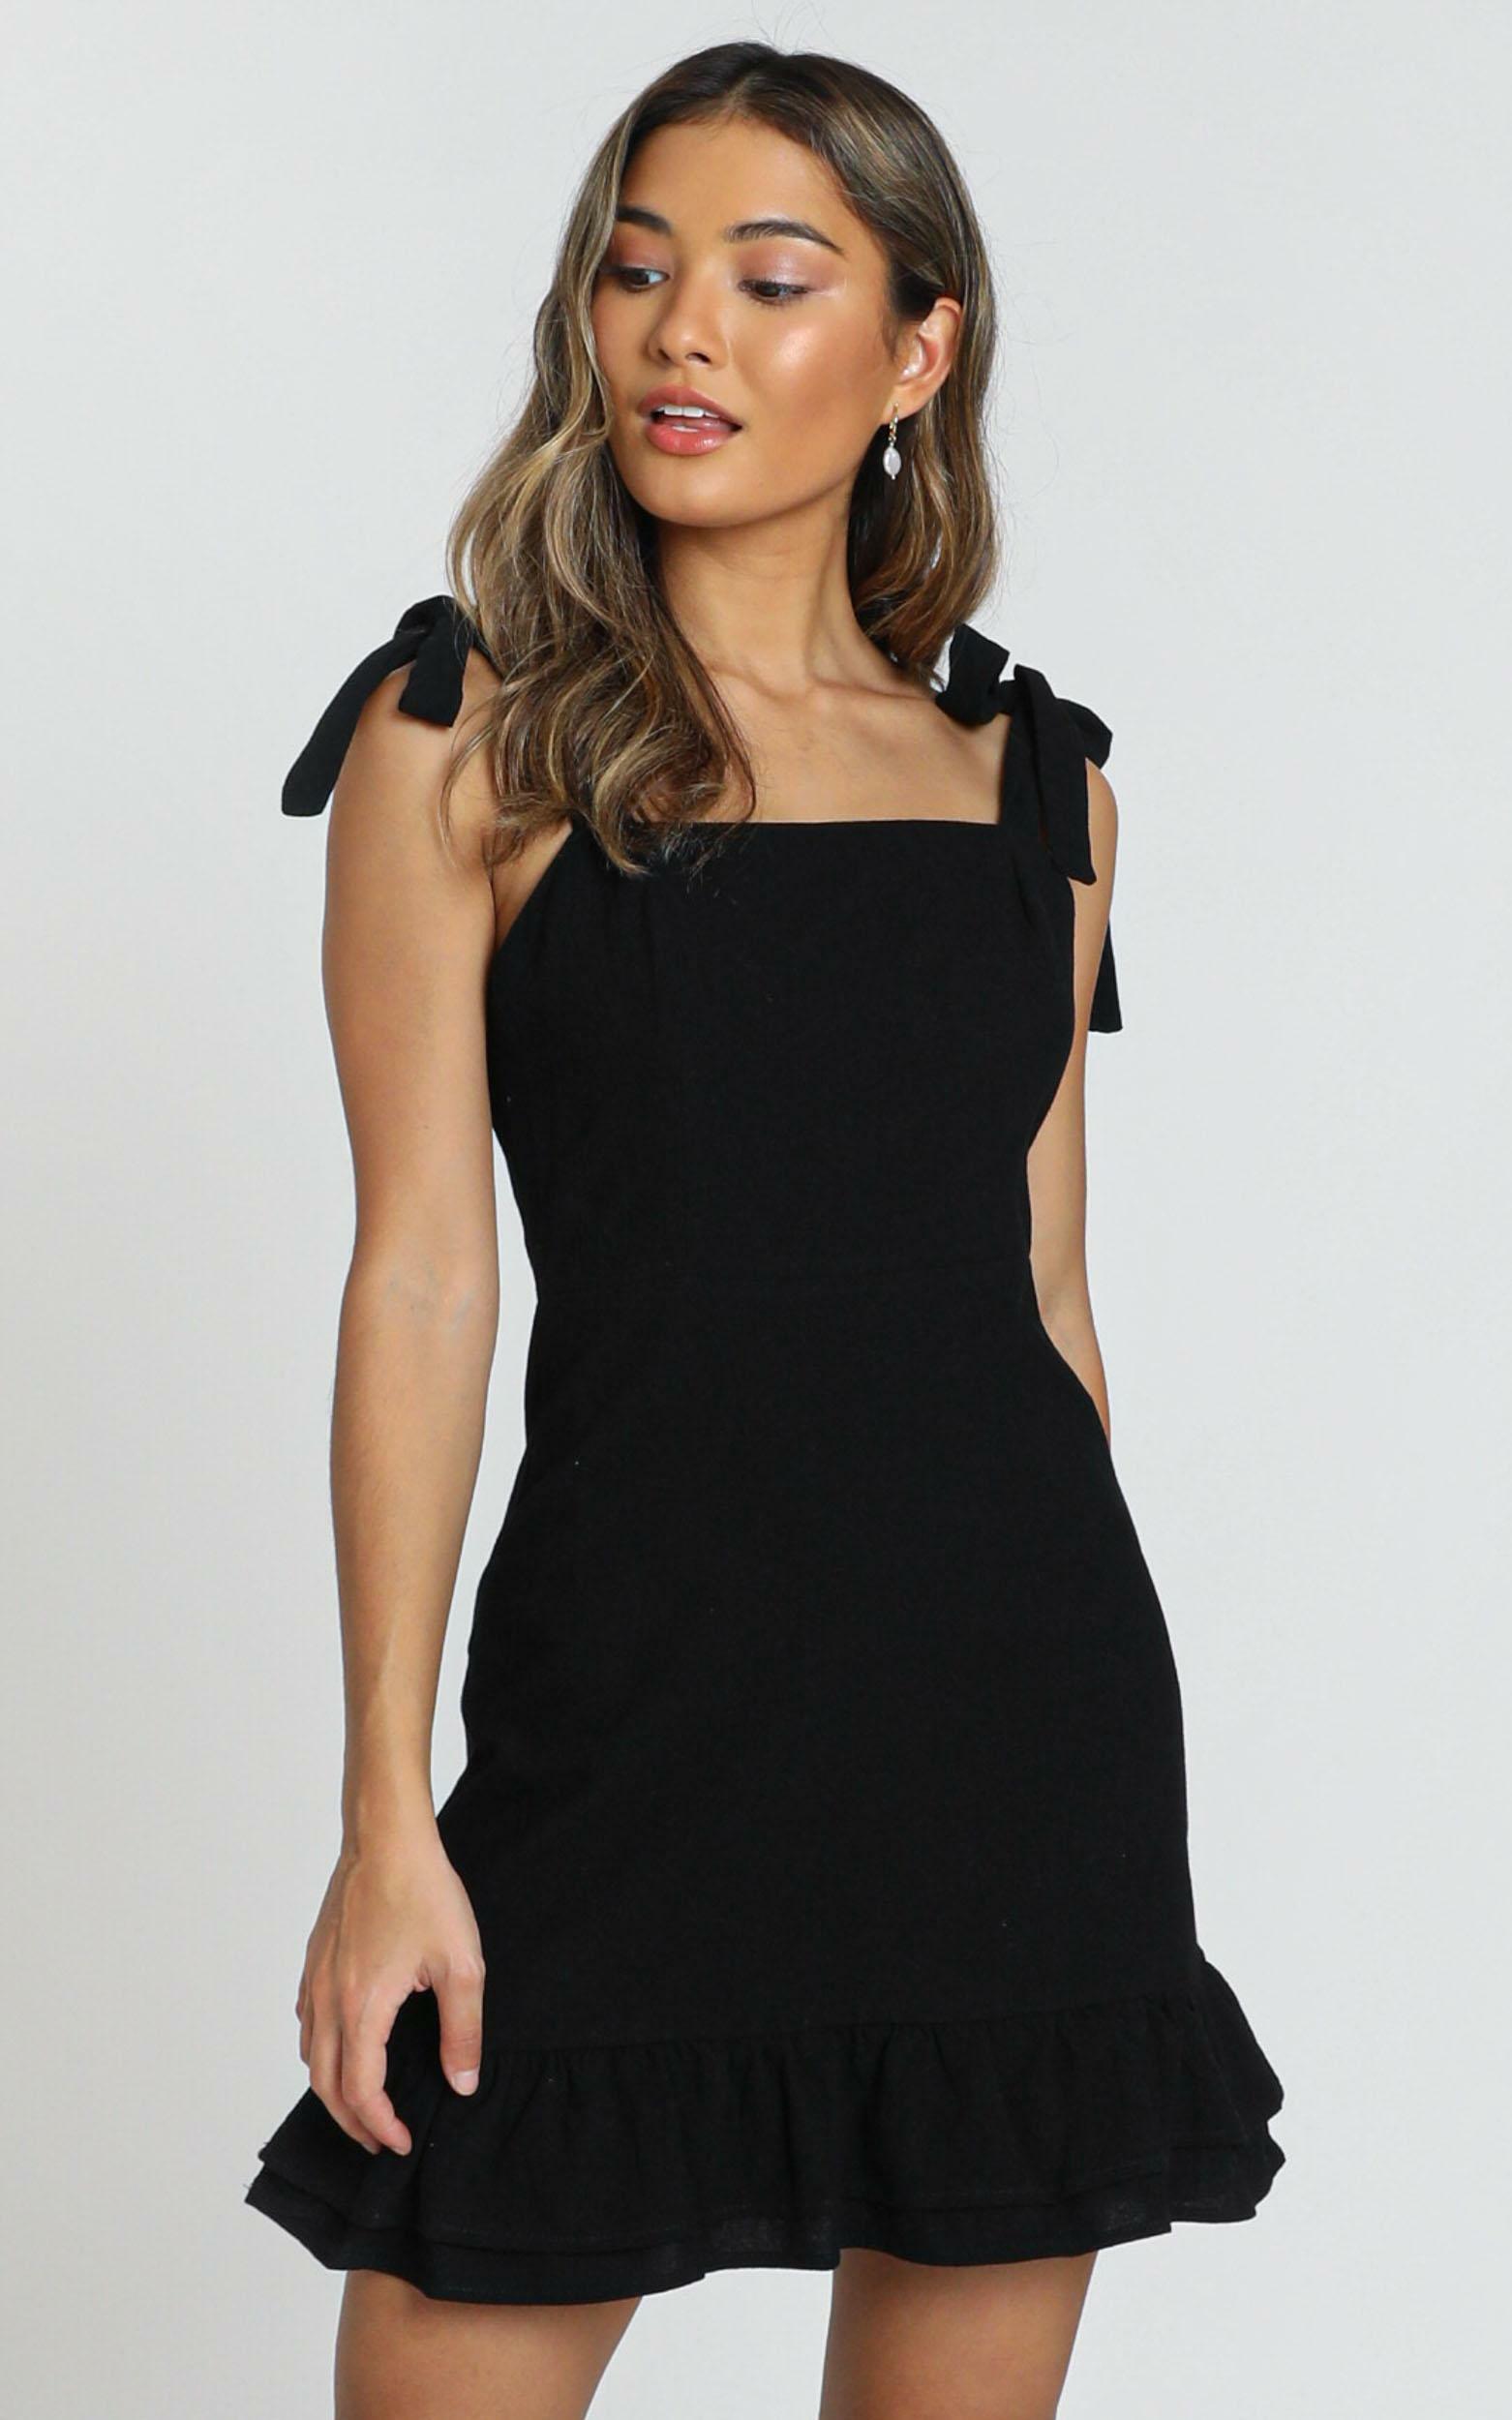 Coastal Getaway Dress in black - 20 (XXXXL), Black, hi-res image number null